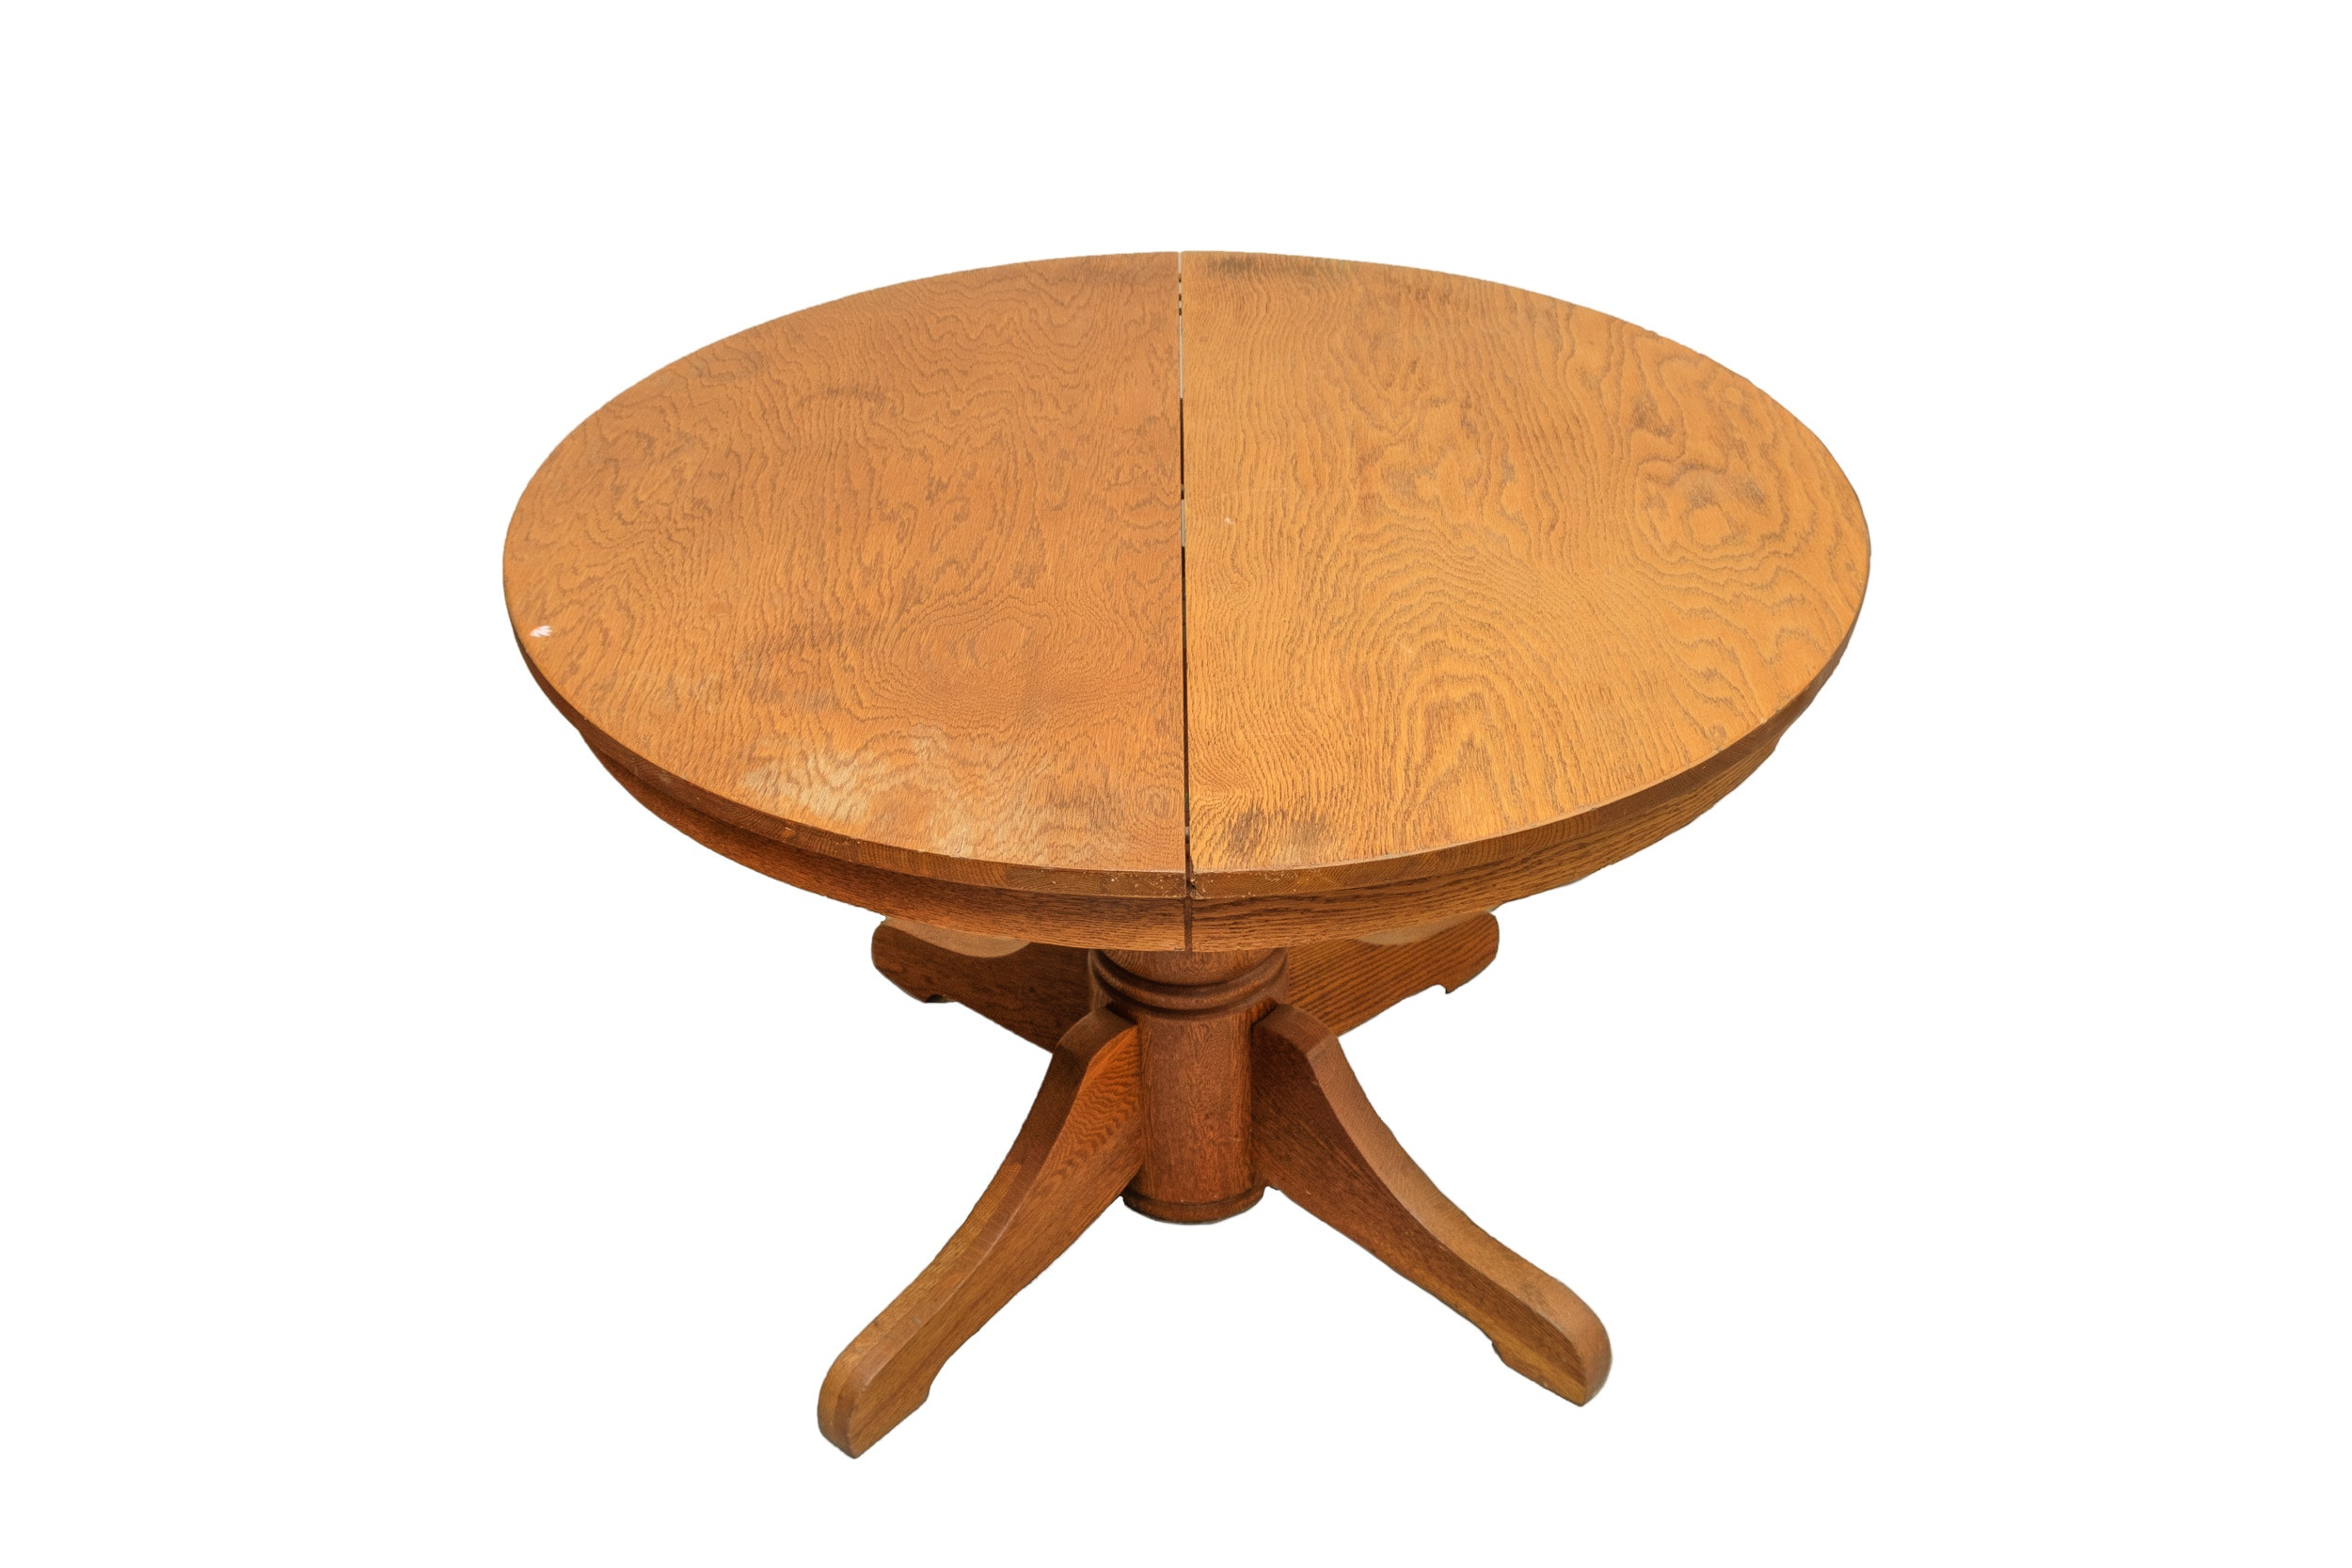 Vintage Round Oak Pedestal Table